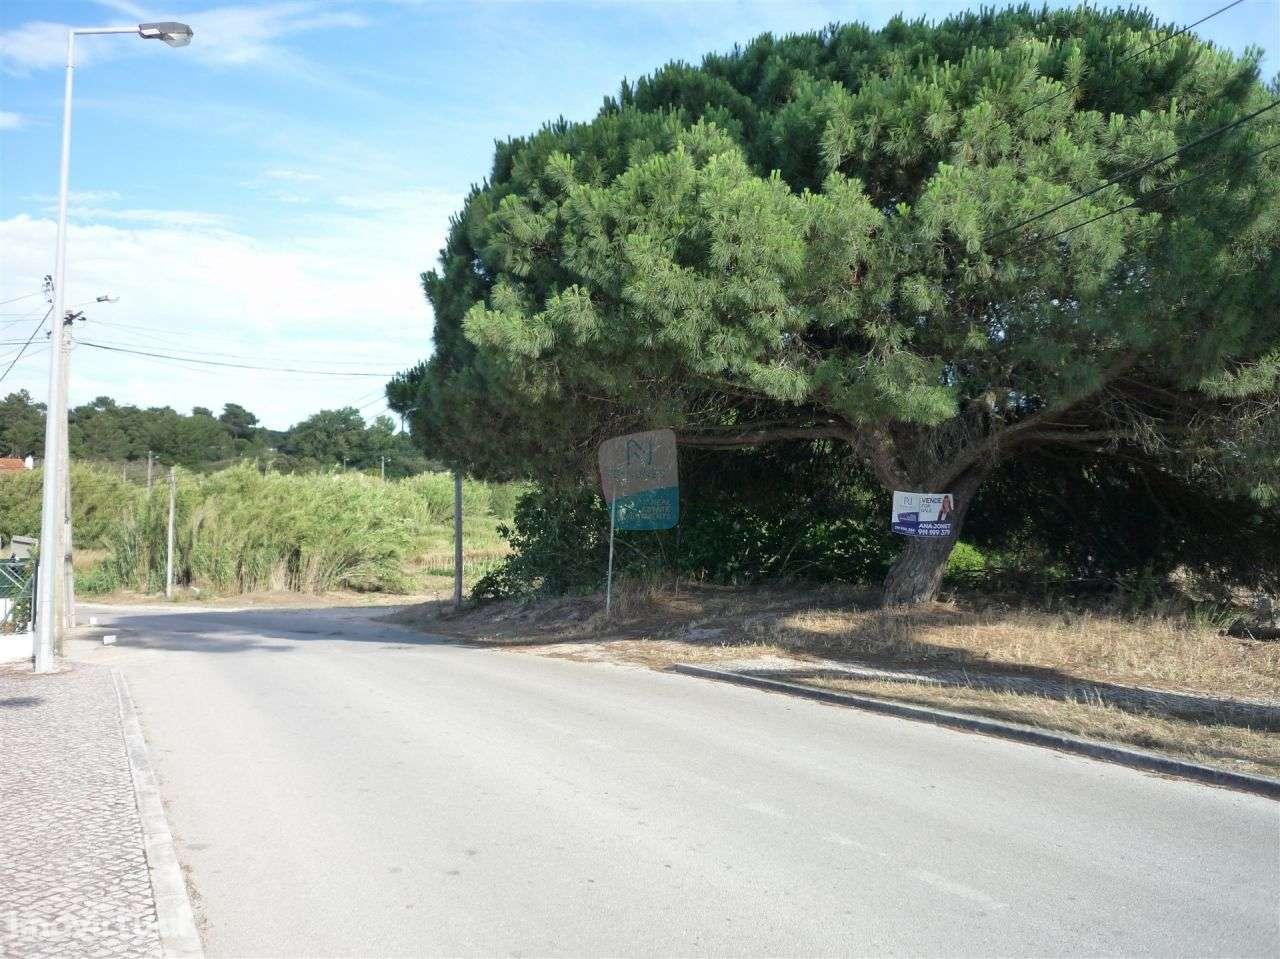 Terreno para comprar, Castelo (Sesimbra), Setúbal - Foto 12